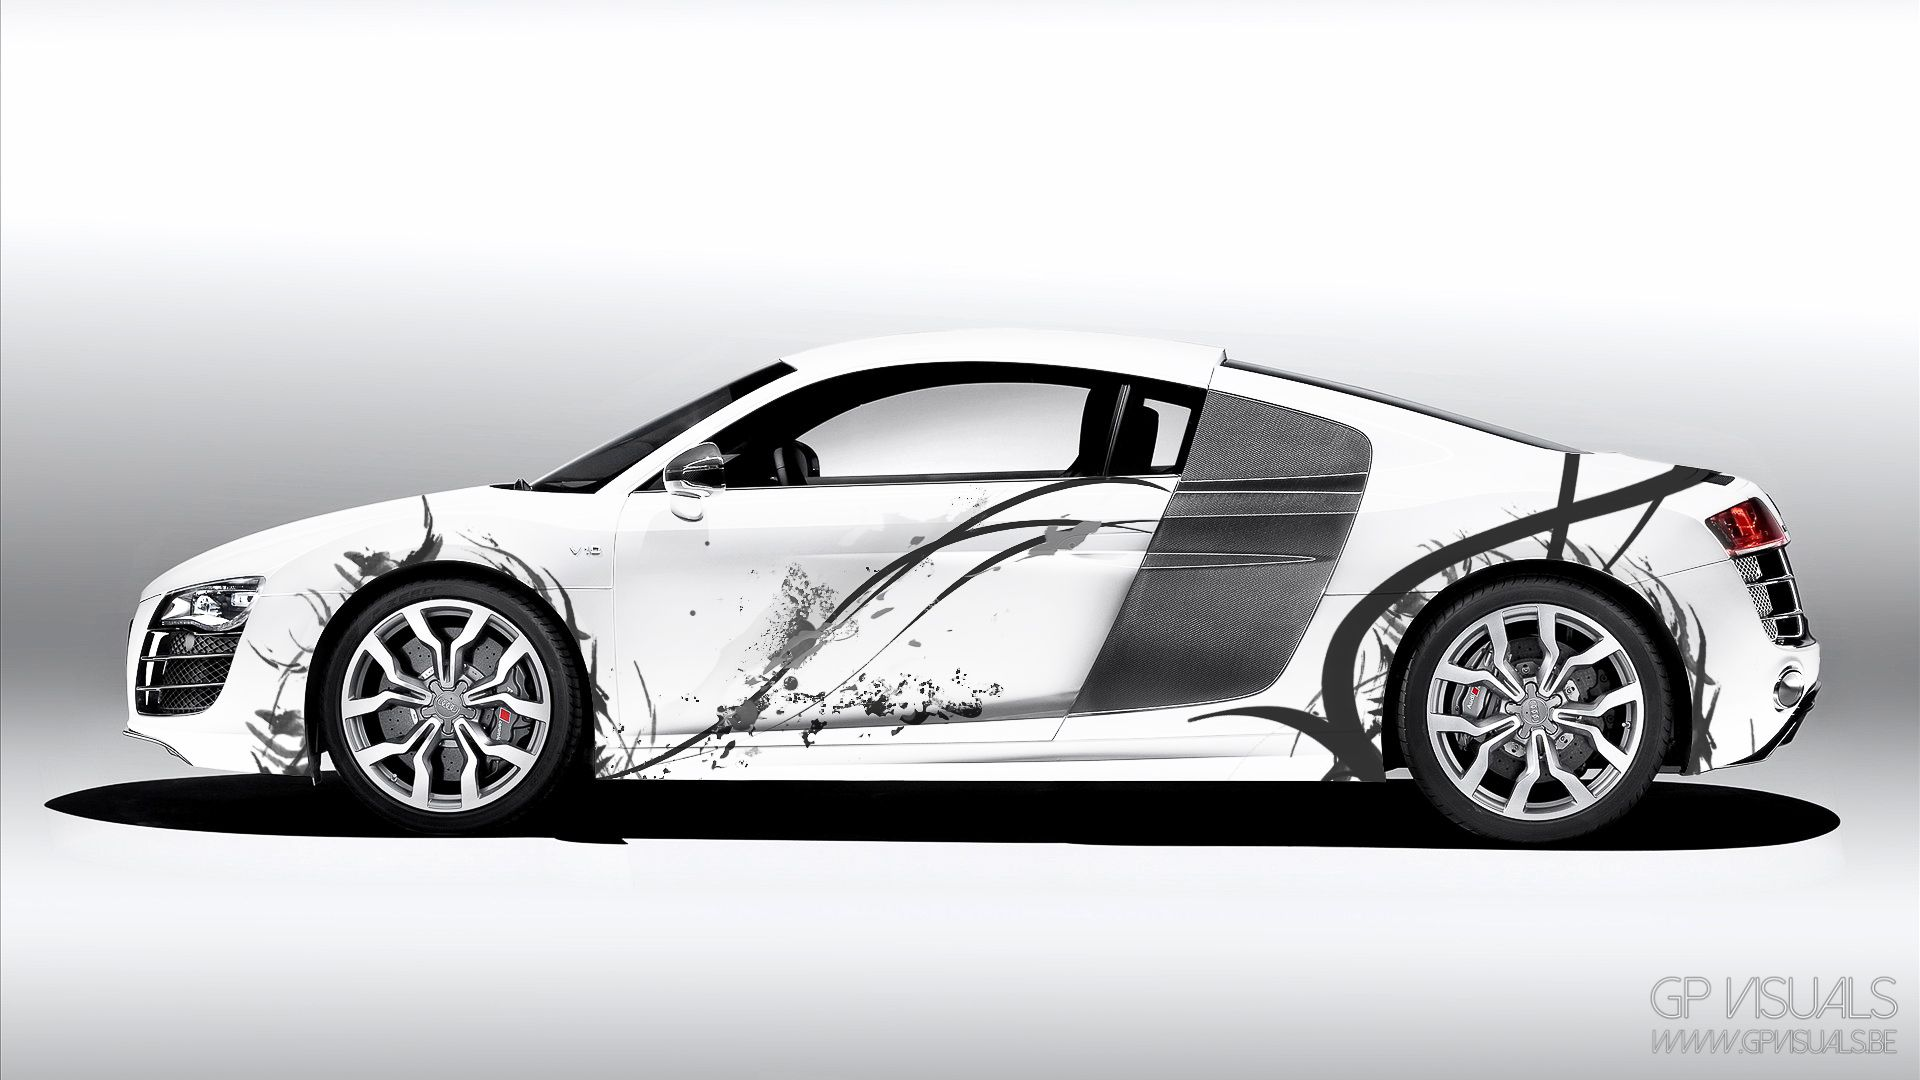 A Body Art Design Of The Audi R8 Audi R8 Euro Design Design Automotive Audi [ 1080 x 1920 Pixel ]